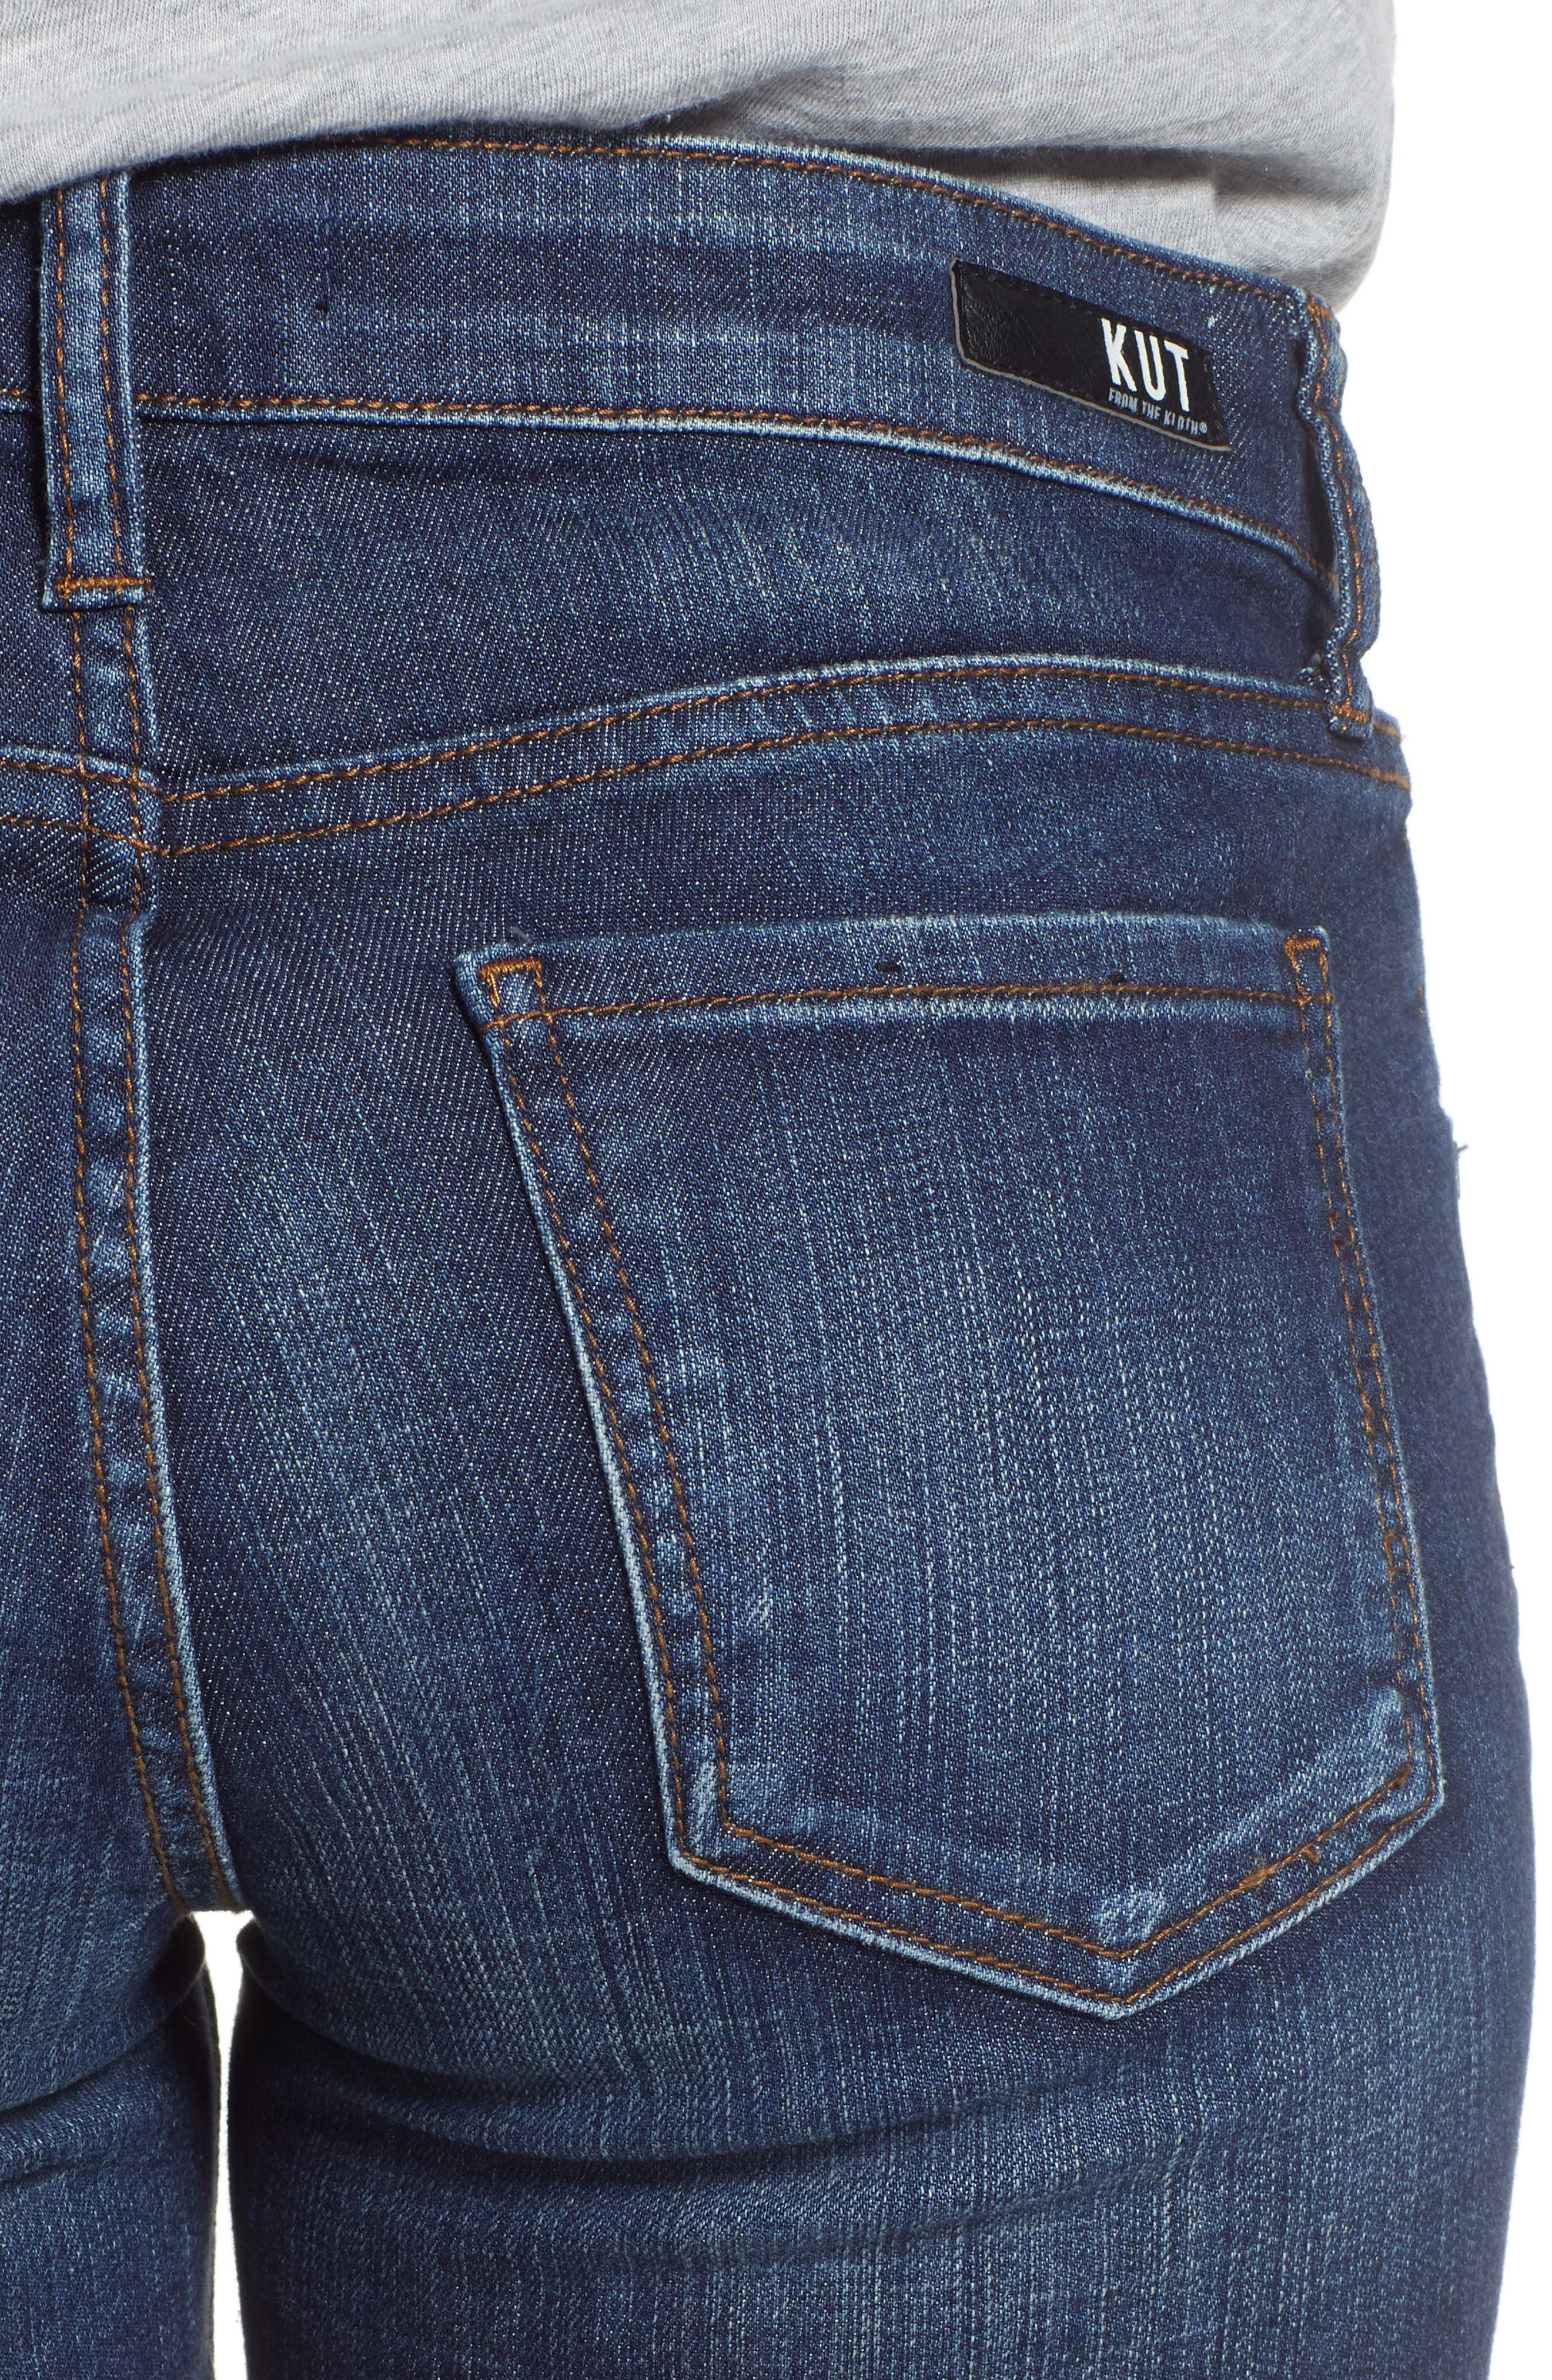 KUT Kollection Gidget Cutoff Denim Shorts,                             Alternate thumbnail 4, color,                             Refine